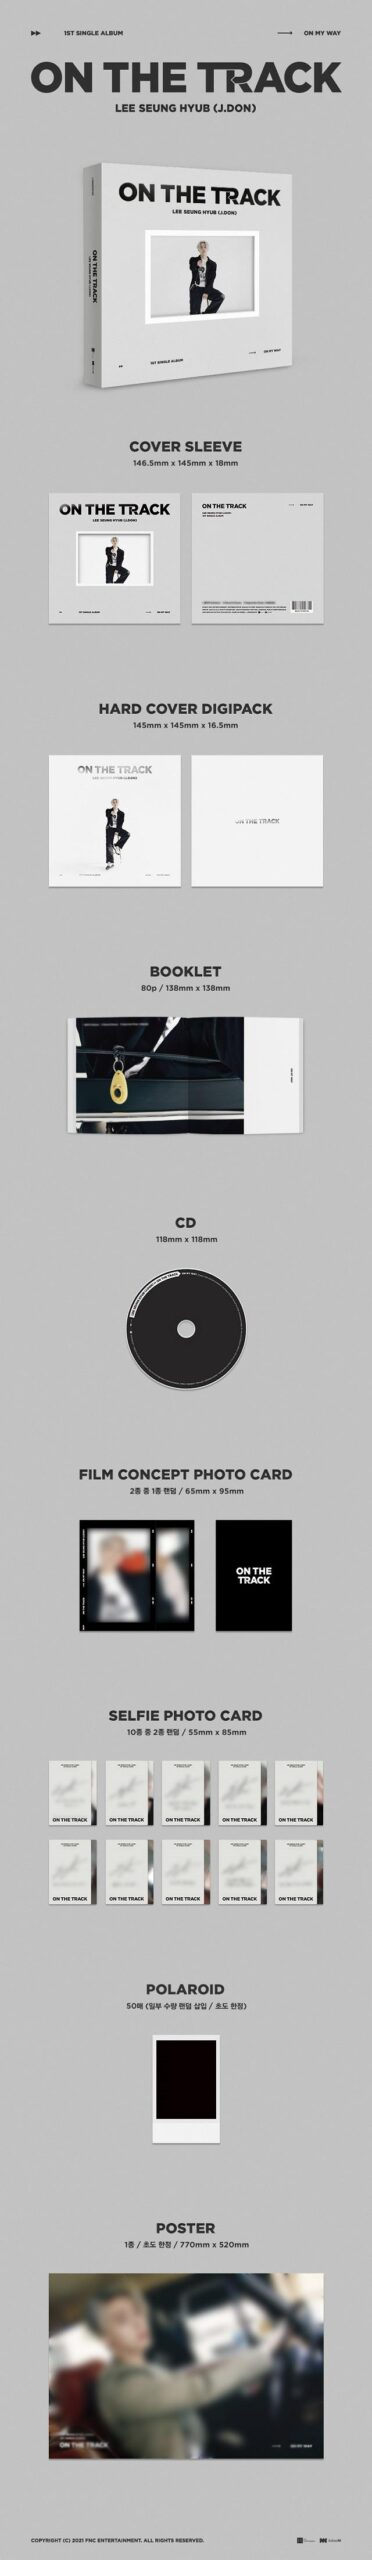 Lee Seunghyub J.DON 1st Single ON THE TRACK Random Ver. Poster